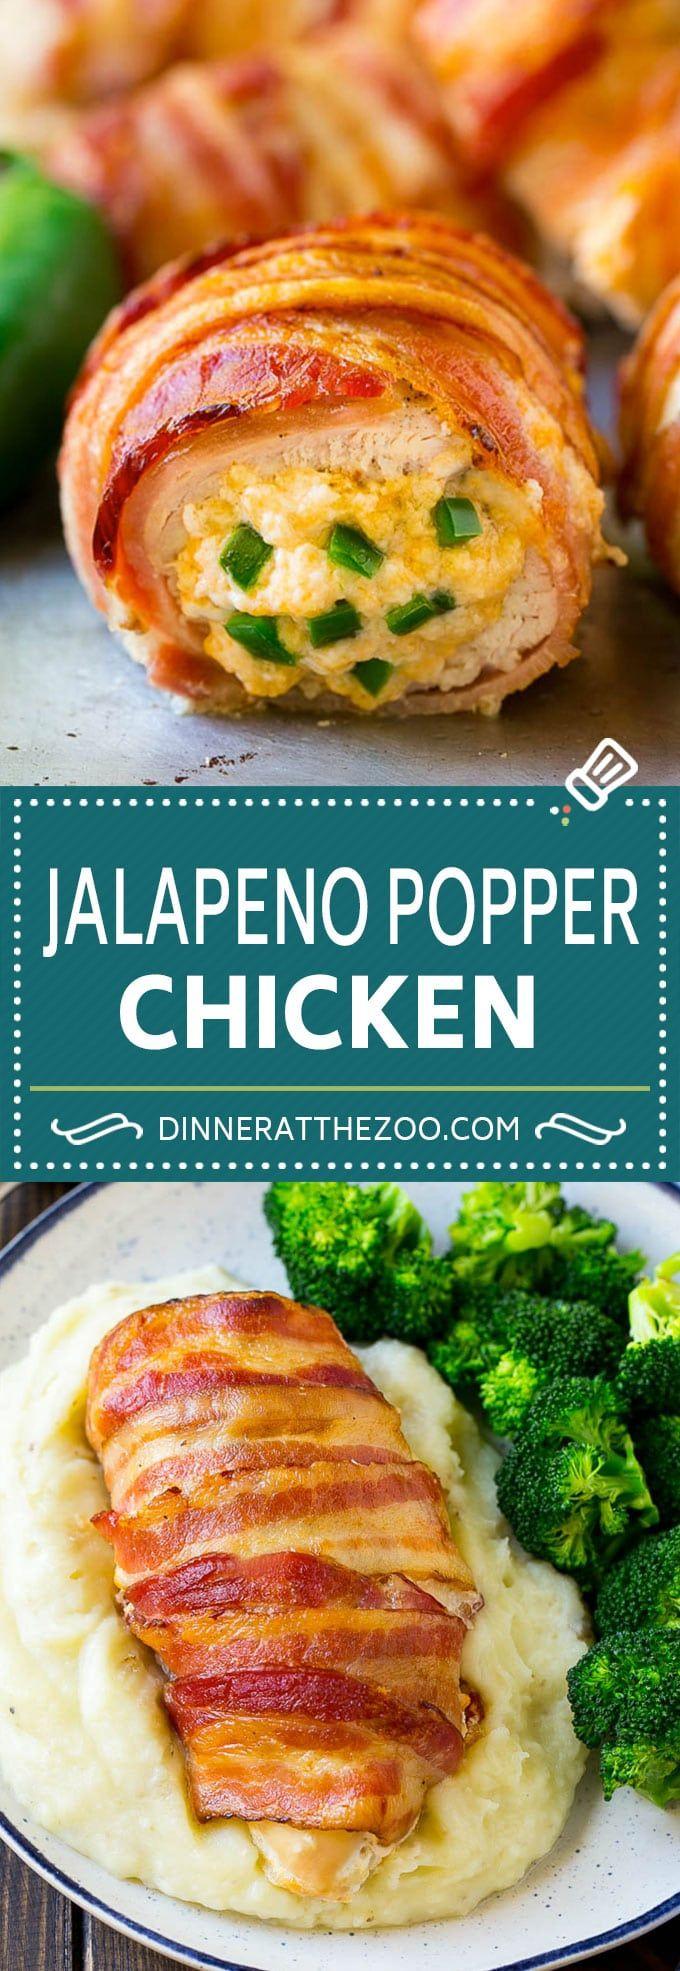 Jalapeno Popper Chicken Recipe   Bacon Wrapped Chicken   Stuffed Chicken   Low Carb Chicken